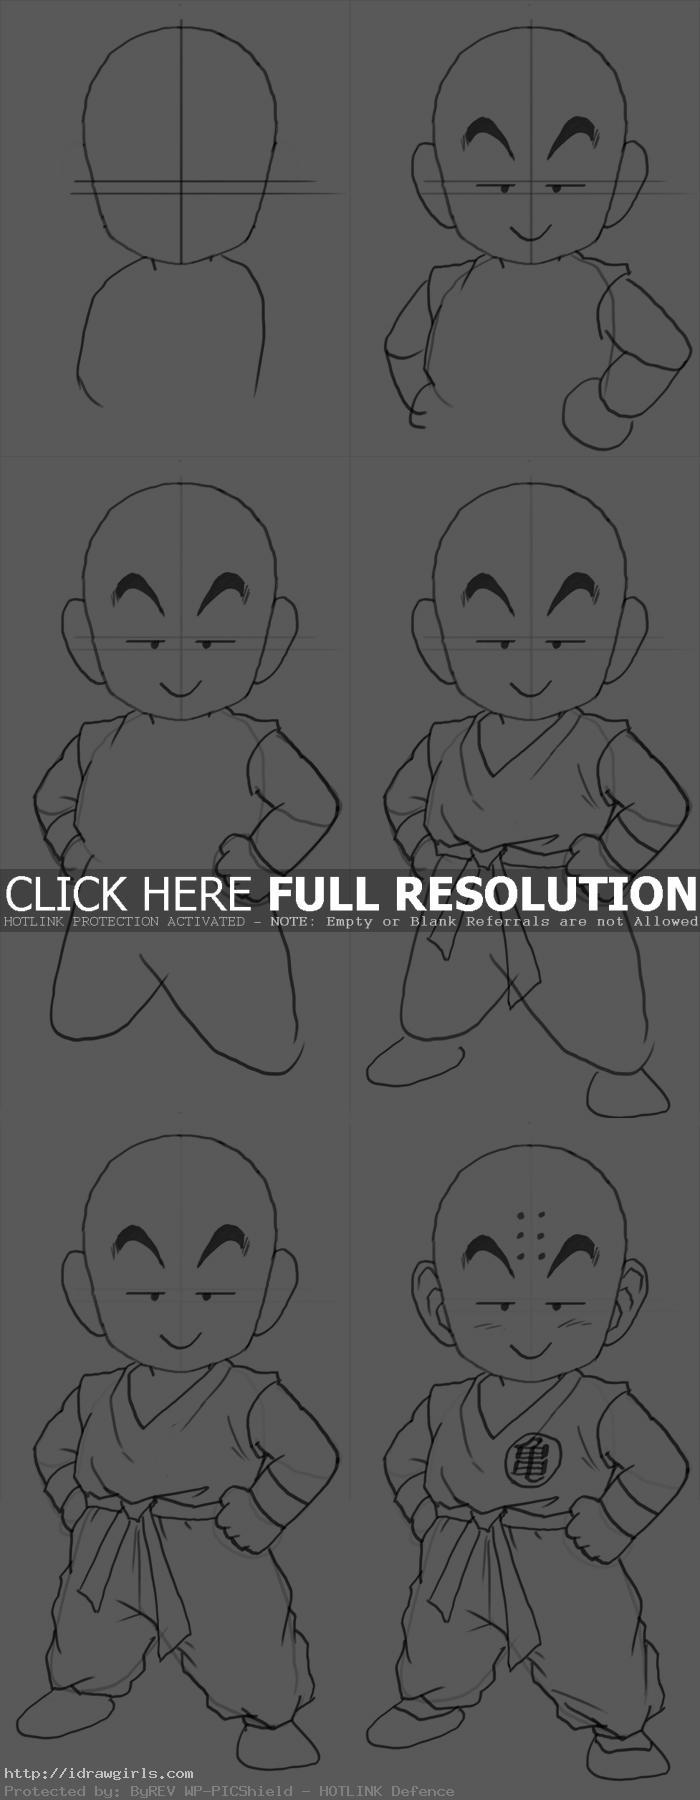 how to draw Krillin